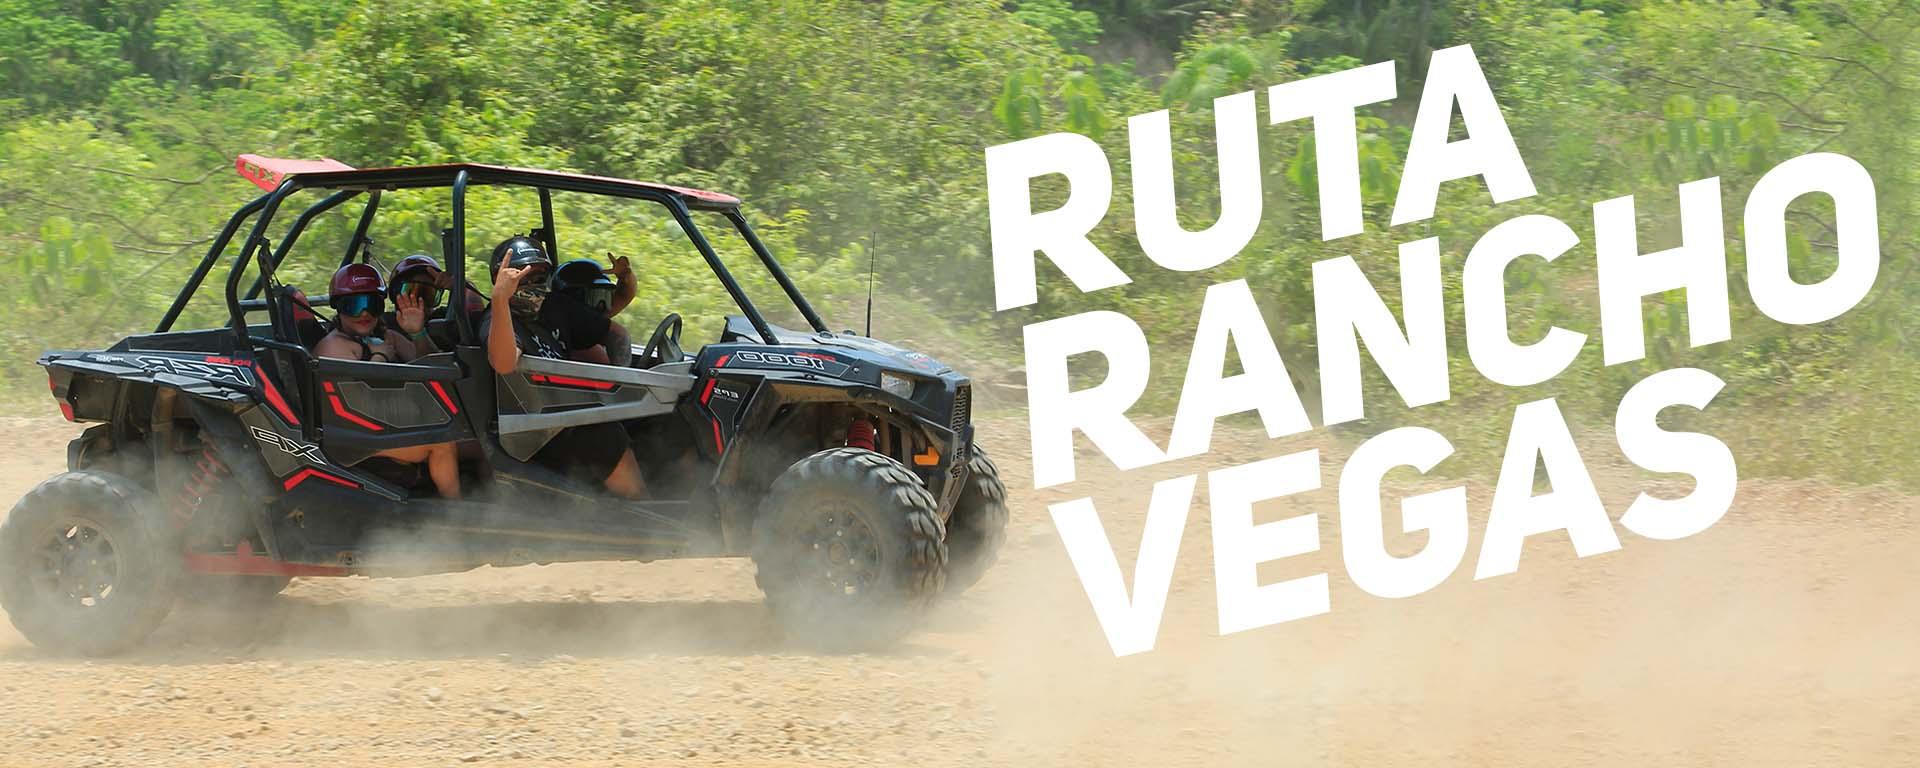 tour-rzr-canopy-adventures-canopy-puerto-vallarta-wild-treks-adventures-05-min